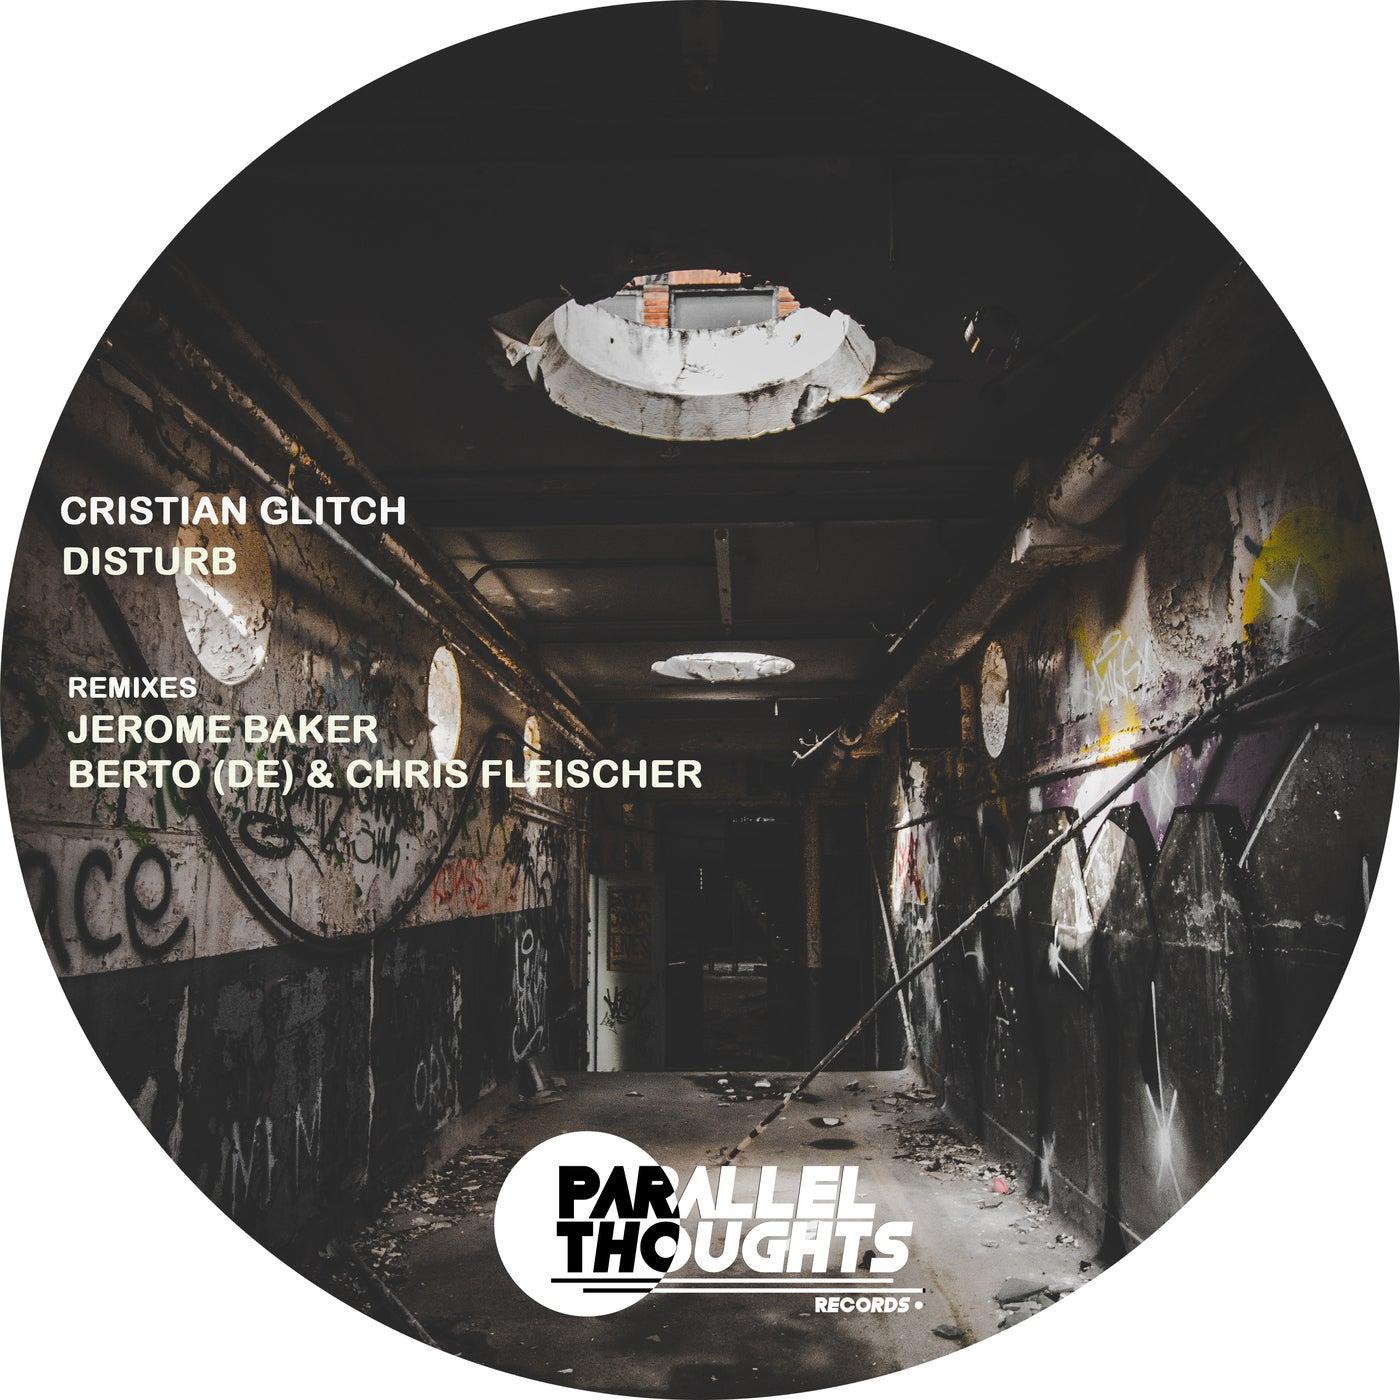 Disturb (Berto DE & Chris Fleischer Remix)